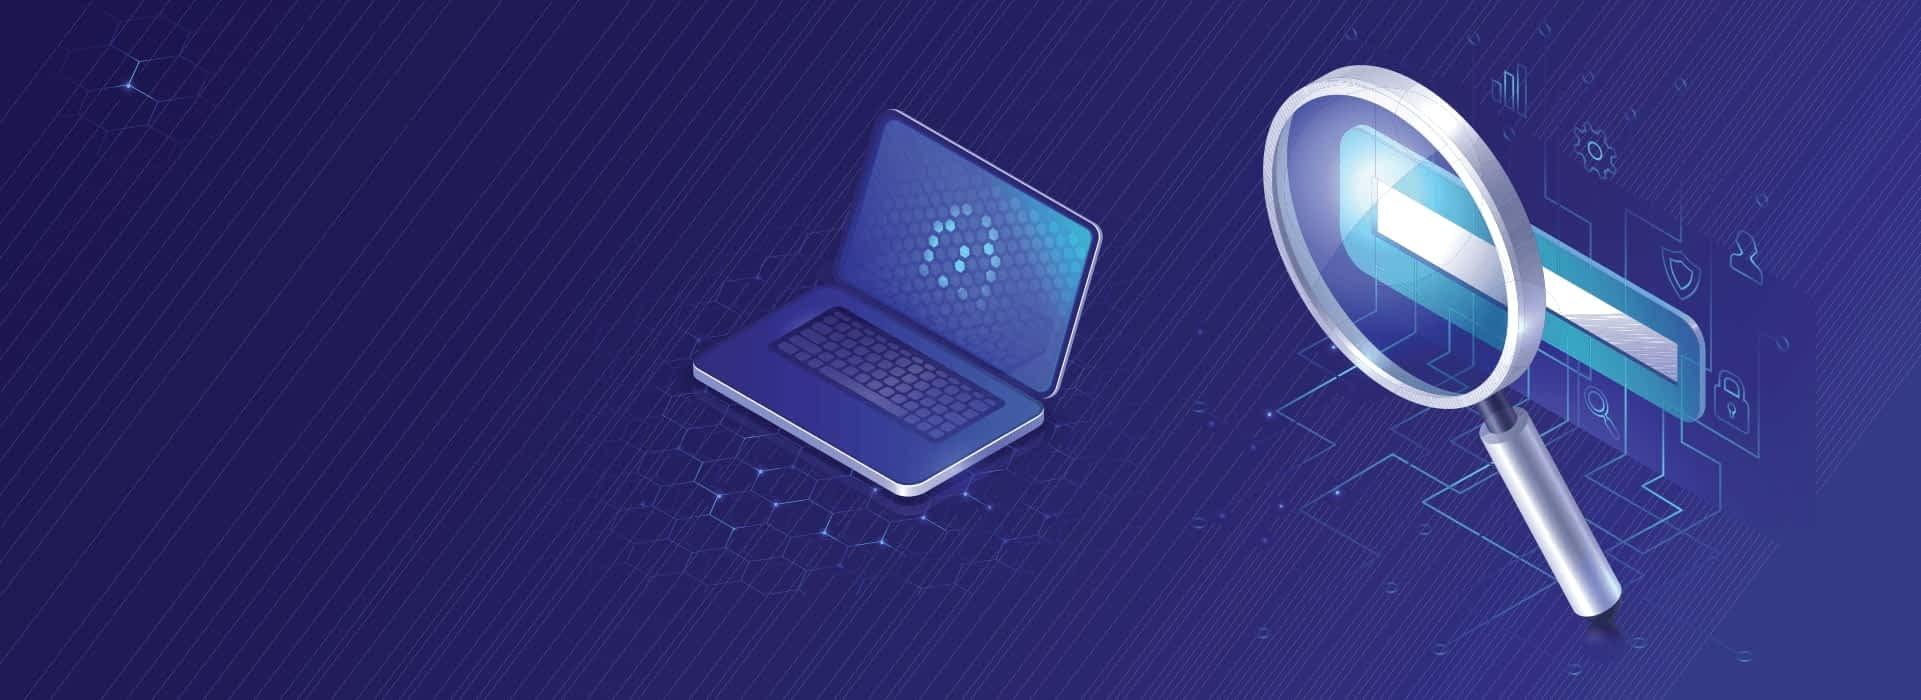 Cyber Diensten IT Zaken BV